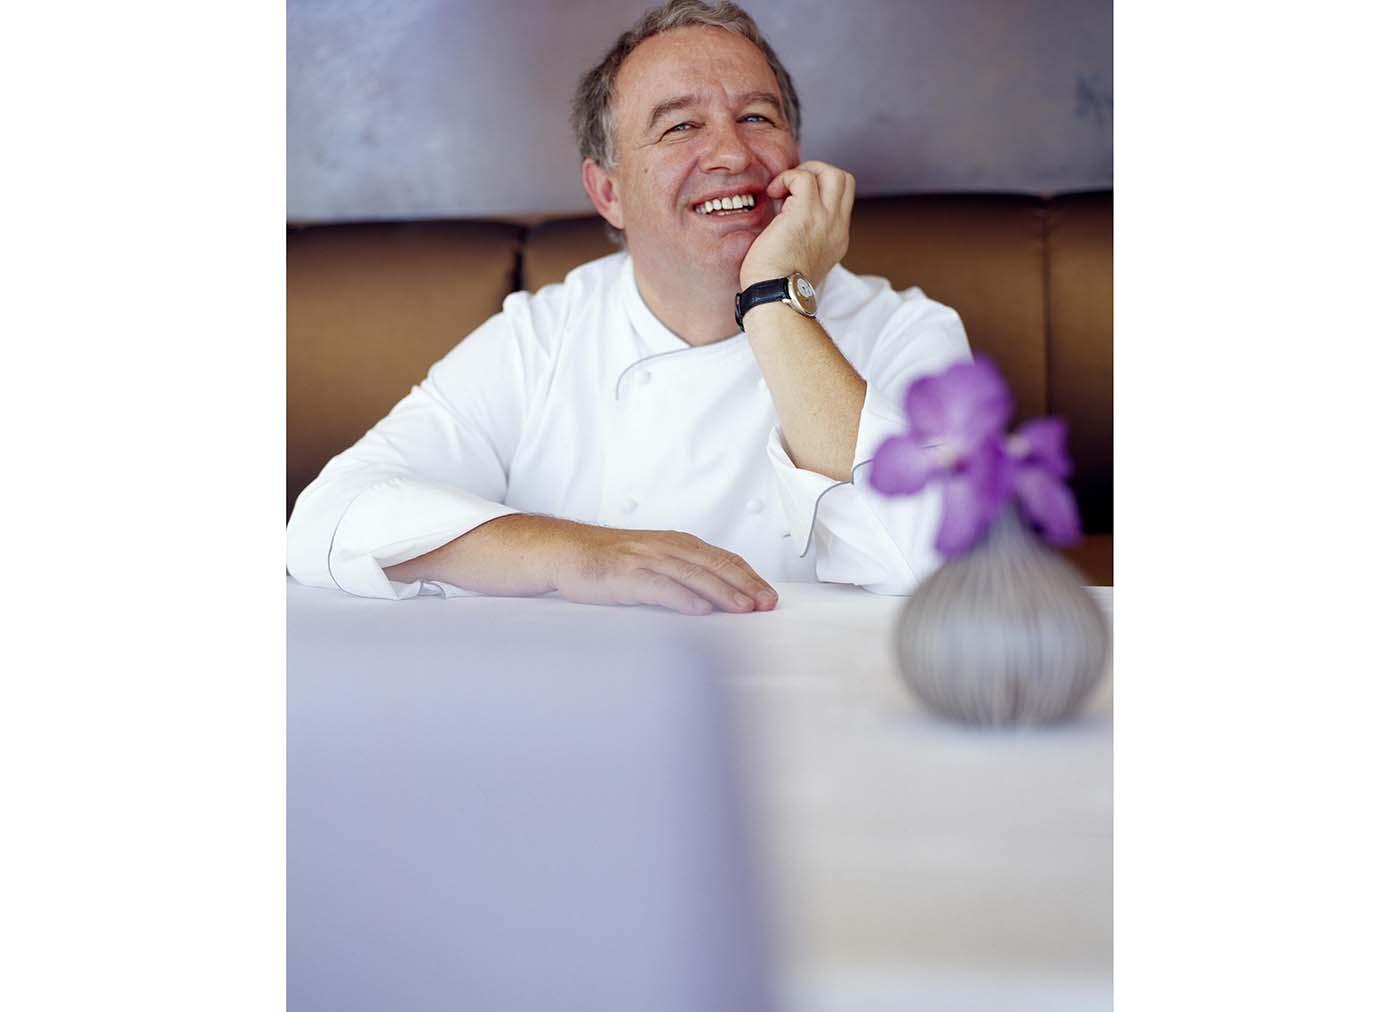 Restaurante Eleven apresenta carta inspirada na vida do Chef Joachim Koerper